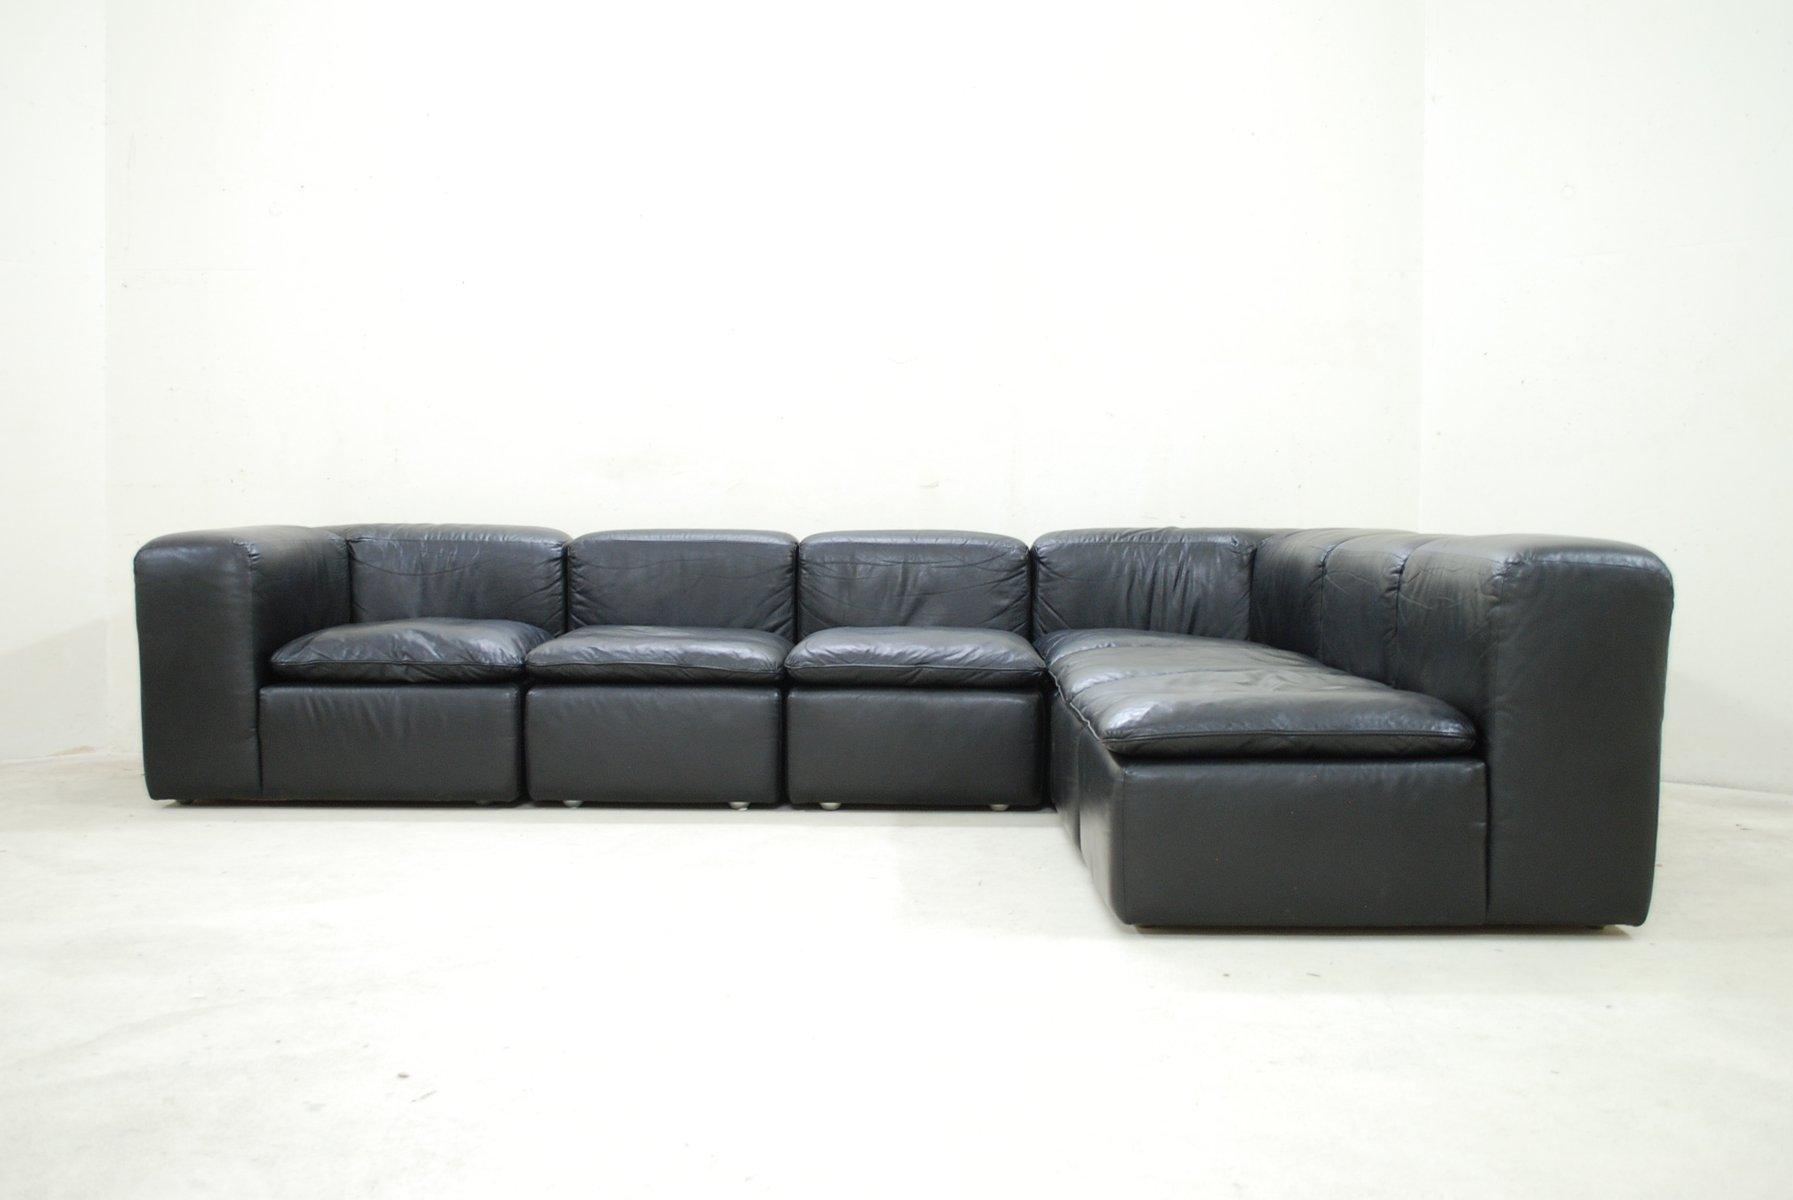 Modular Black Cube Design WK 550 Leather Sofa By Ernst Martin Dettinger For  WK Möbel